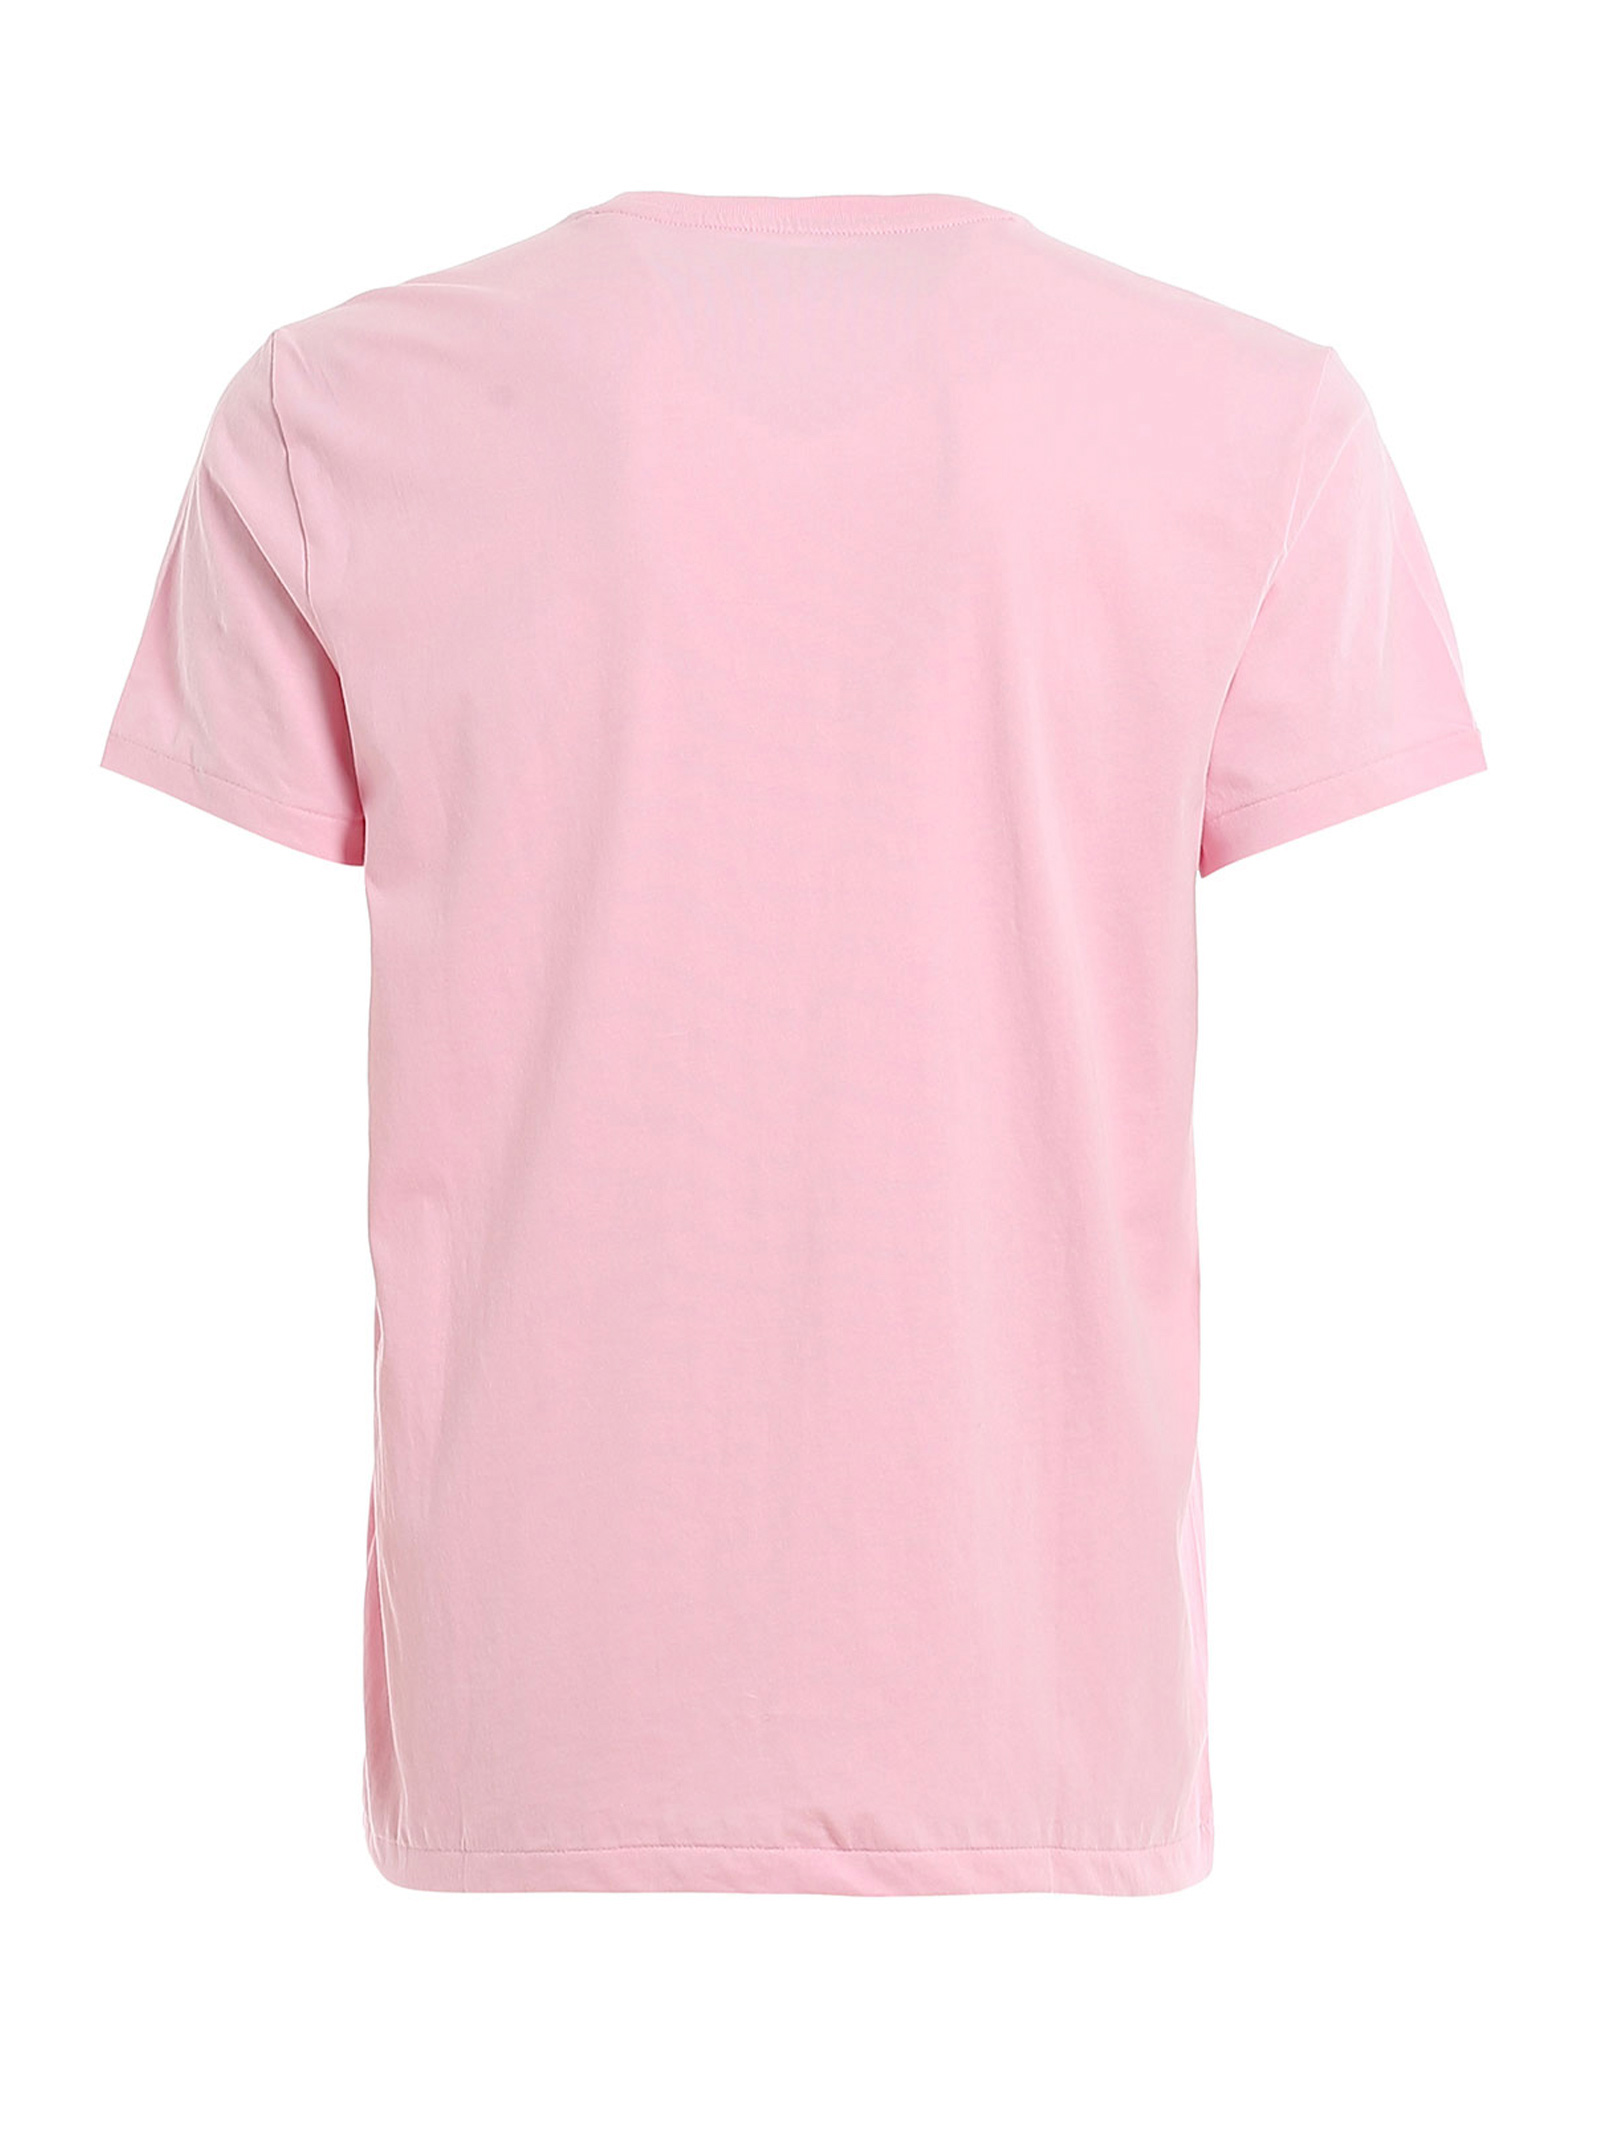 T-shirt rosa girocollo slimfit RALPH LAUREN   T-shirt   710-671438145